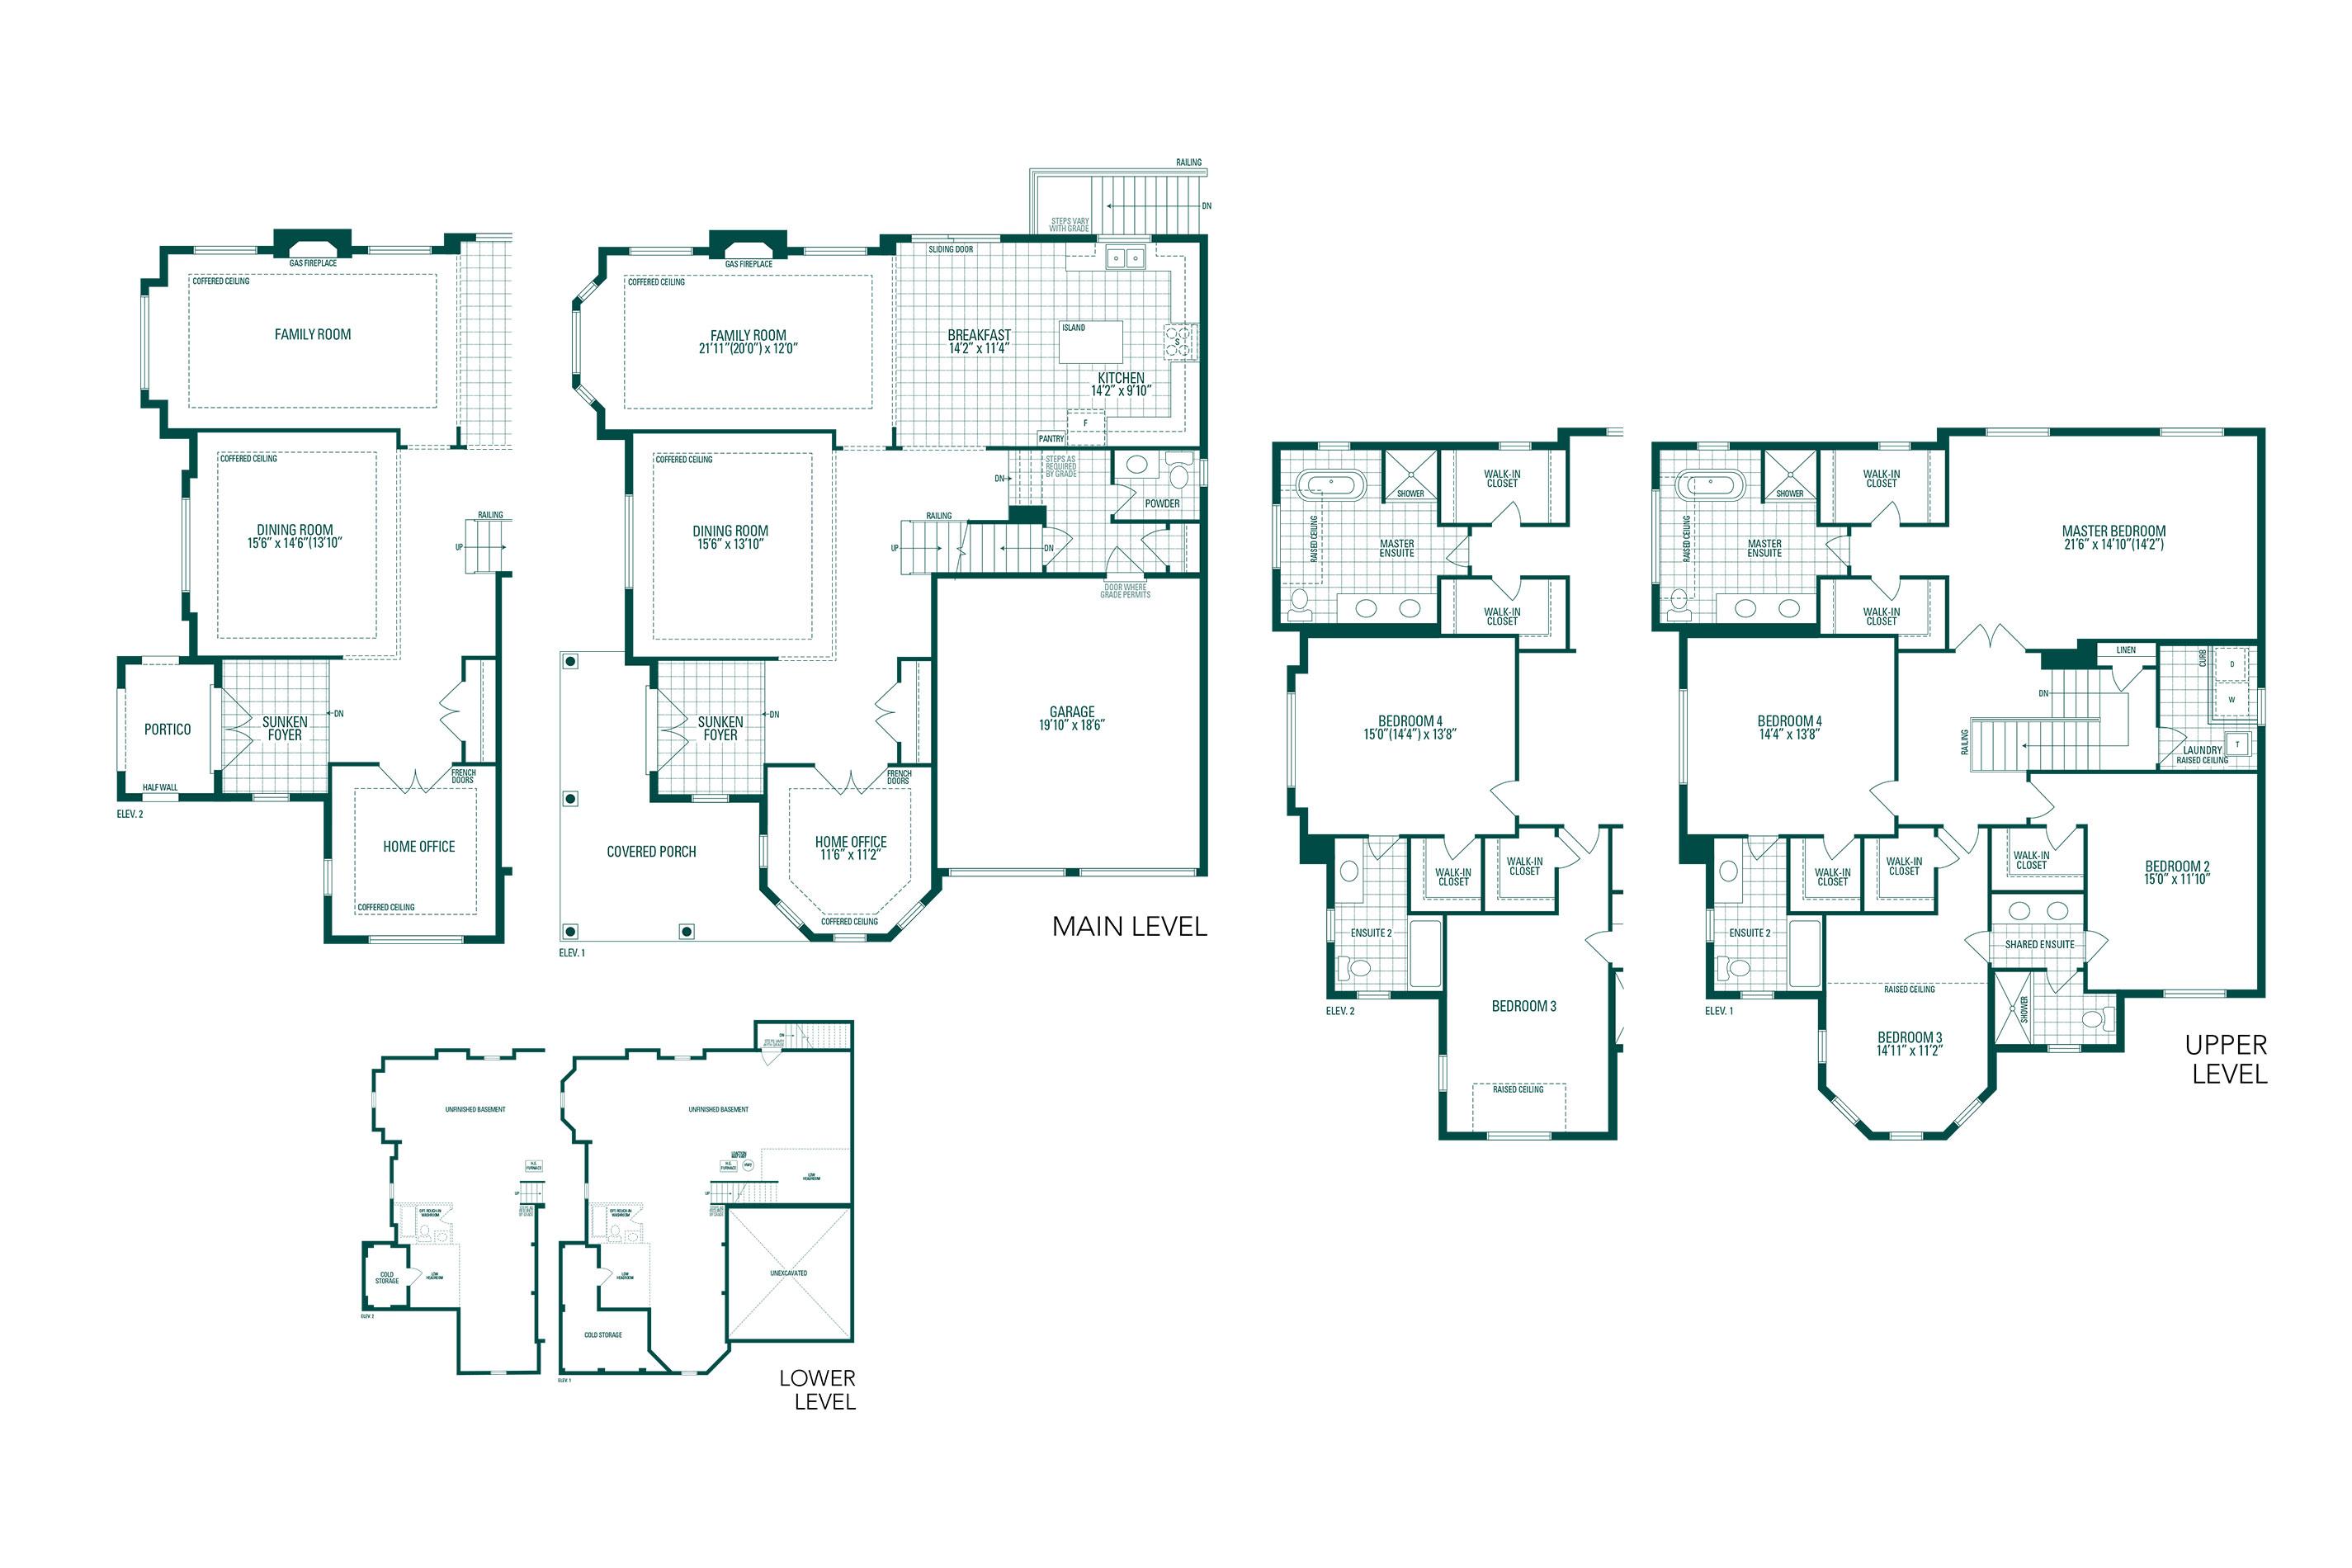 Lot# 24 Meadow March Cresent Floorplan